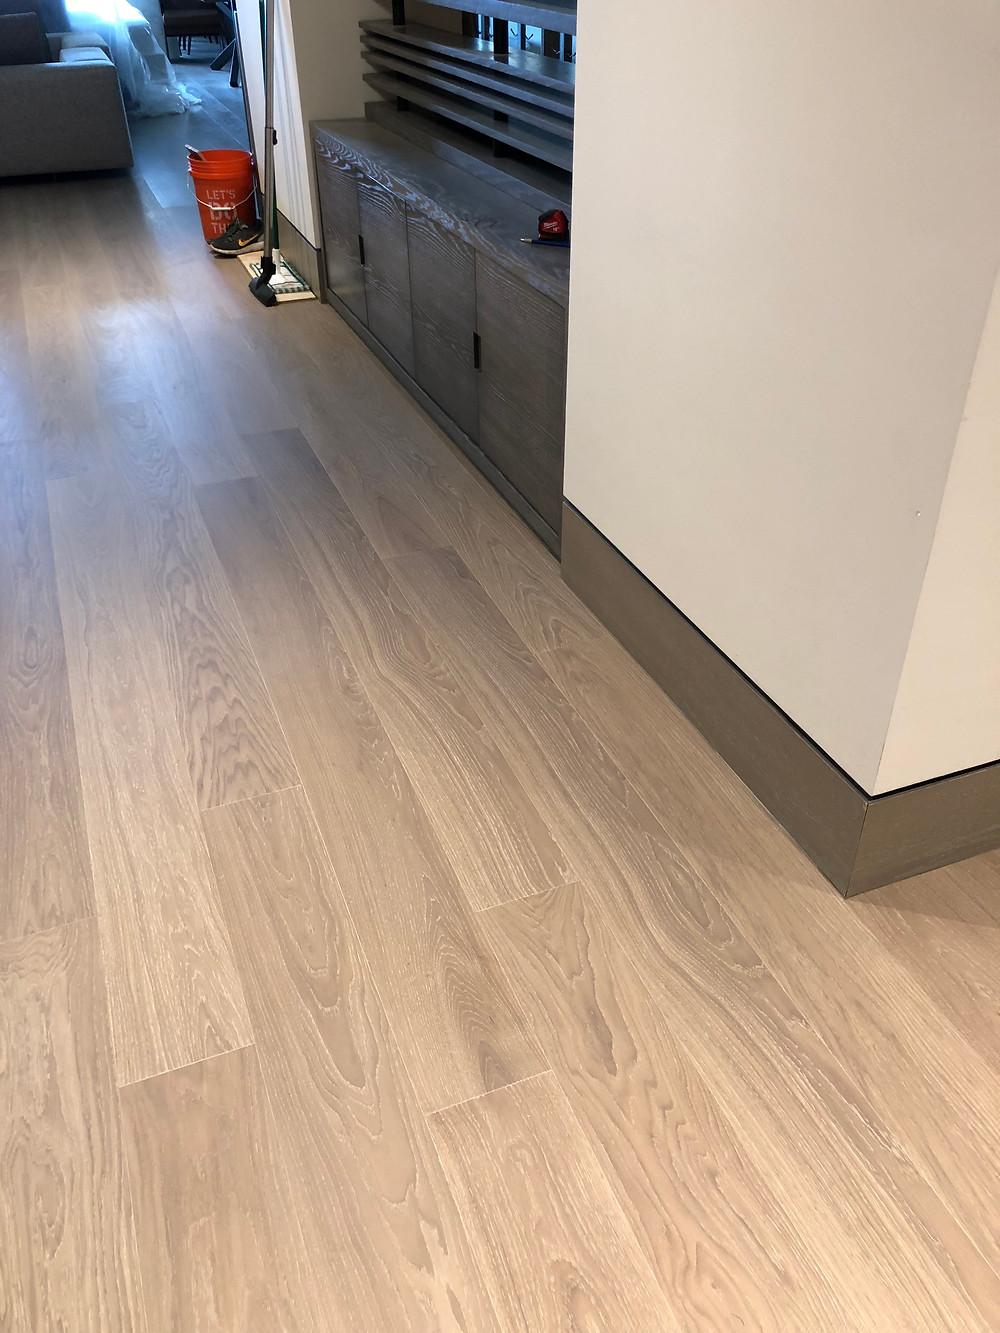 Pre finished white oak wood floors or unfinished white oak wood floors